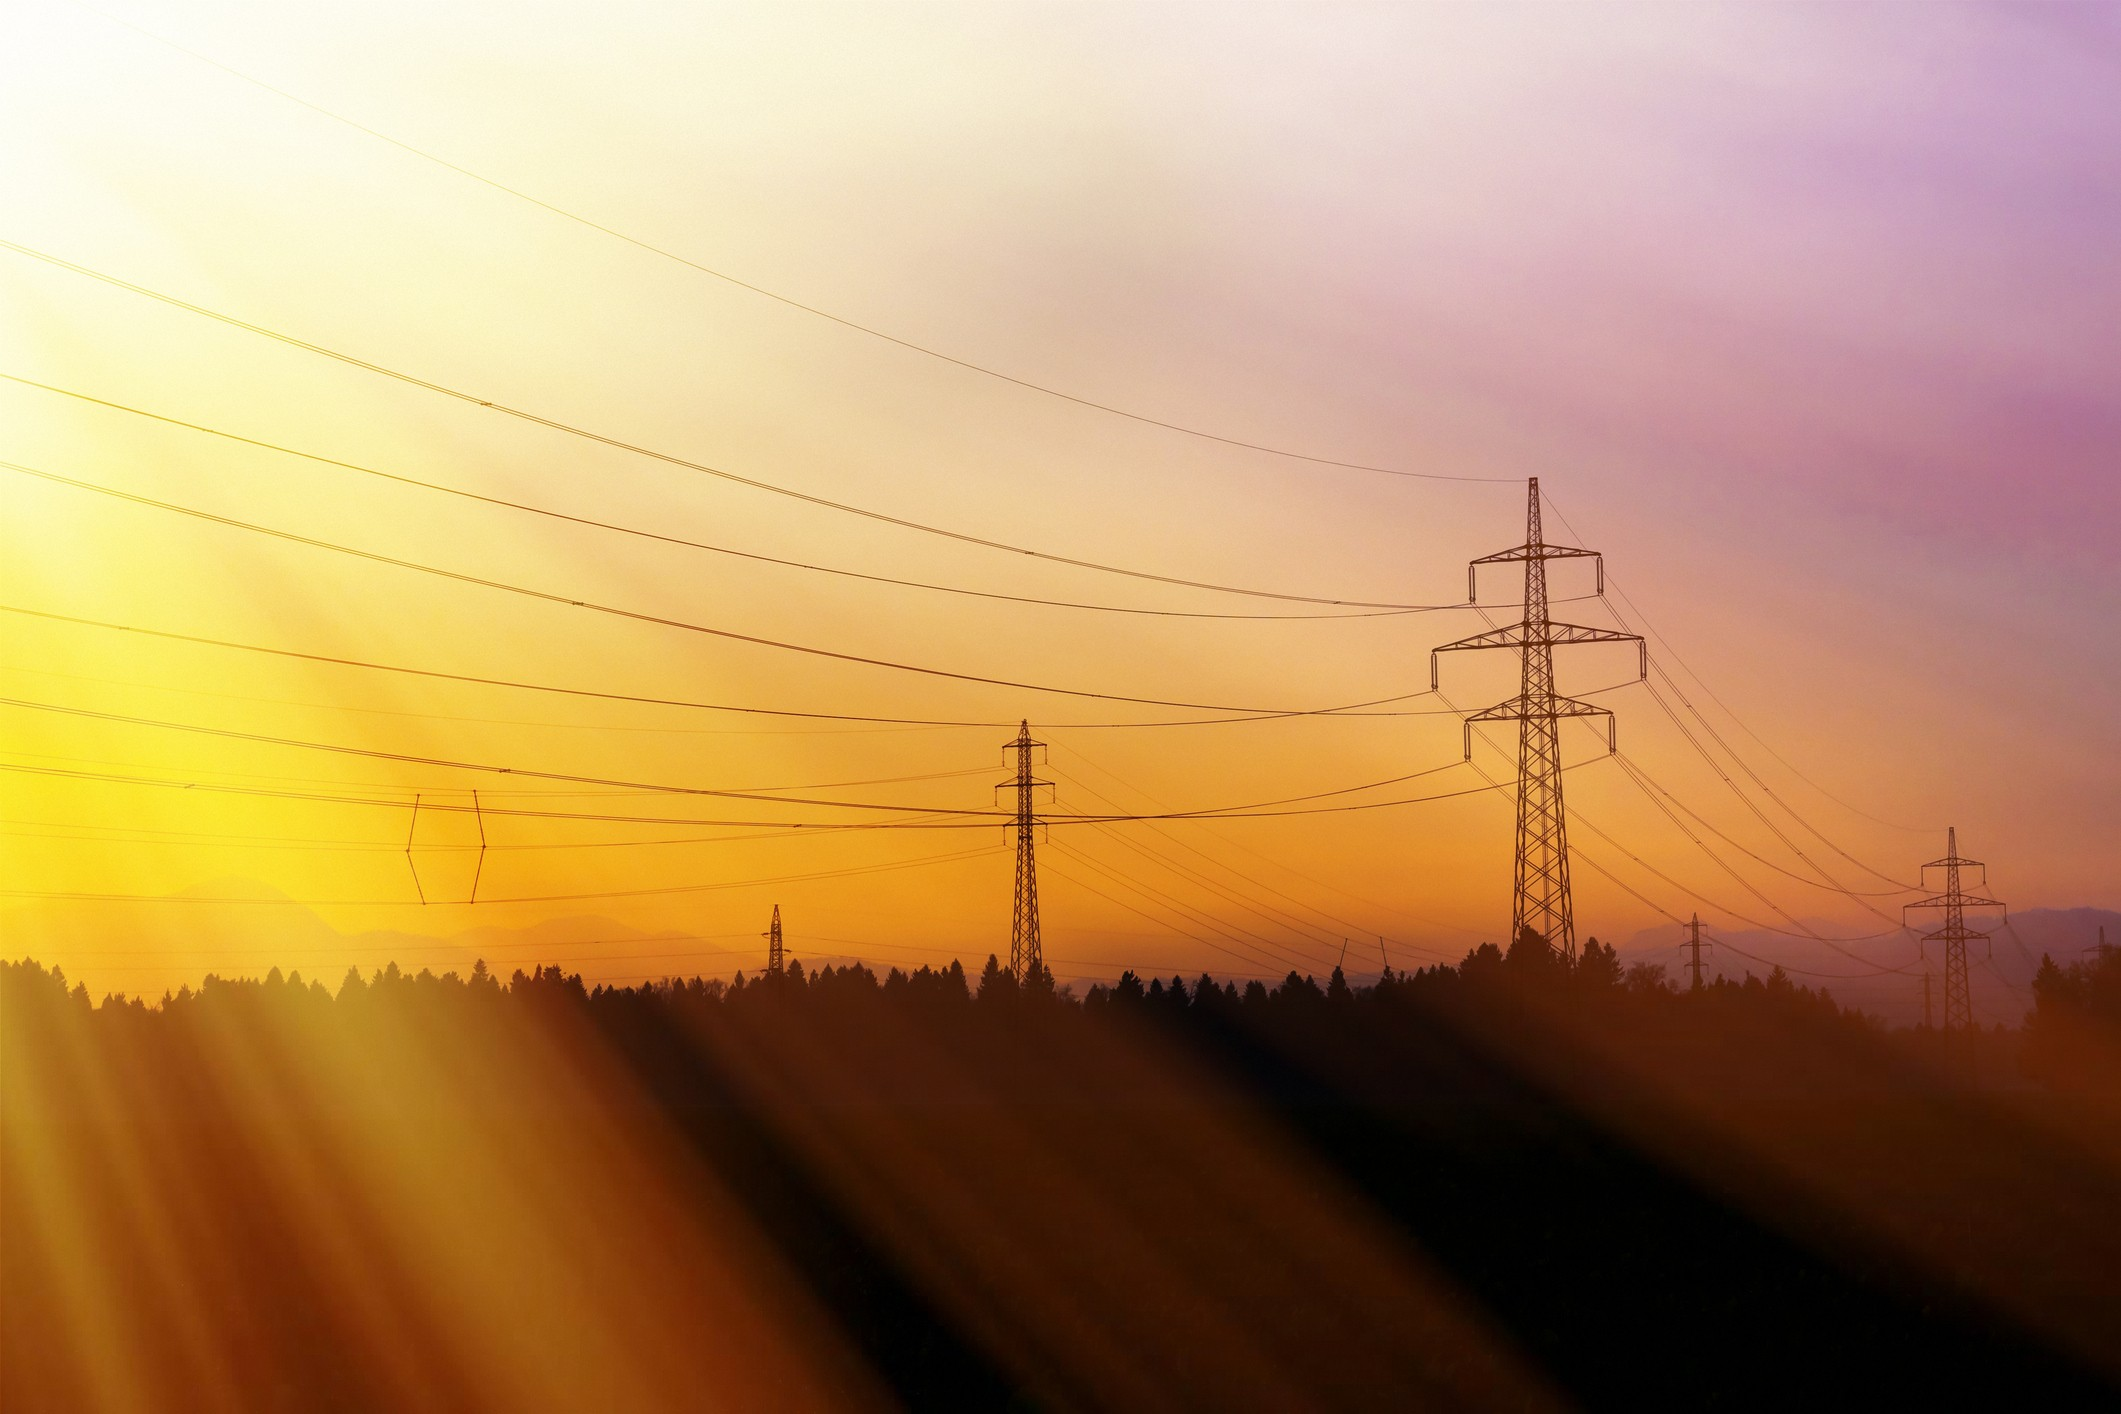 Orange and Rockland Utilities, Inc  | LinkedIn